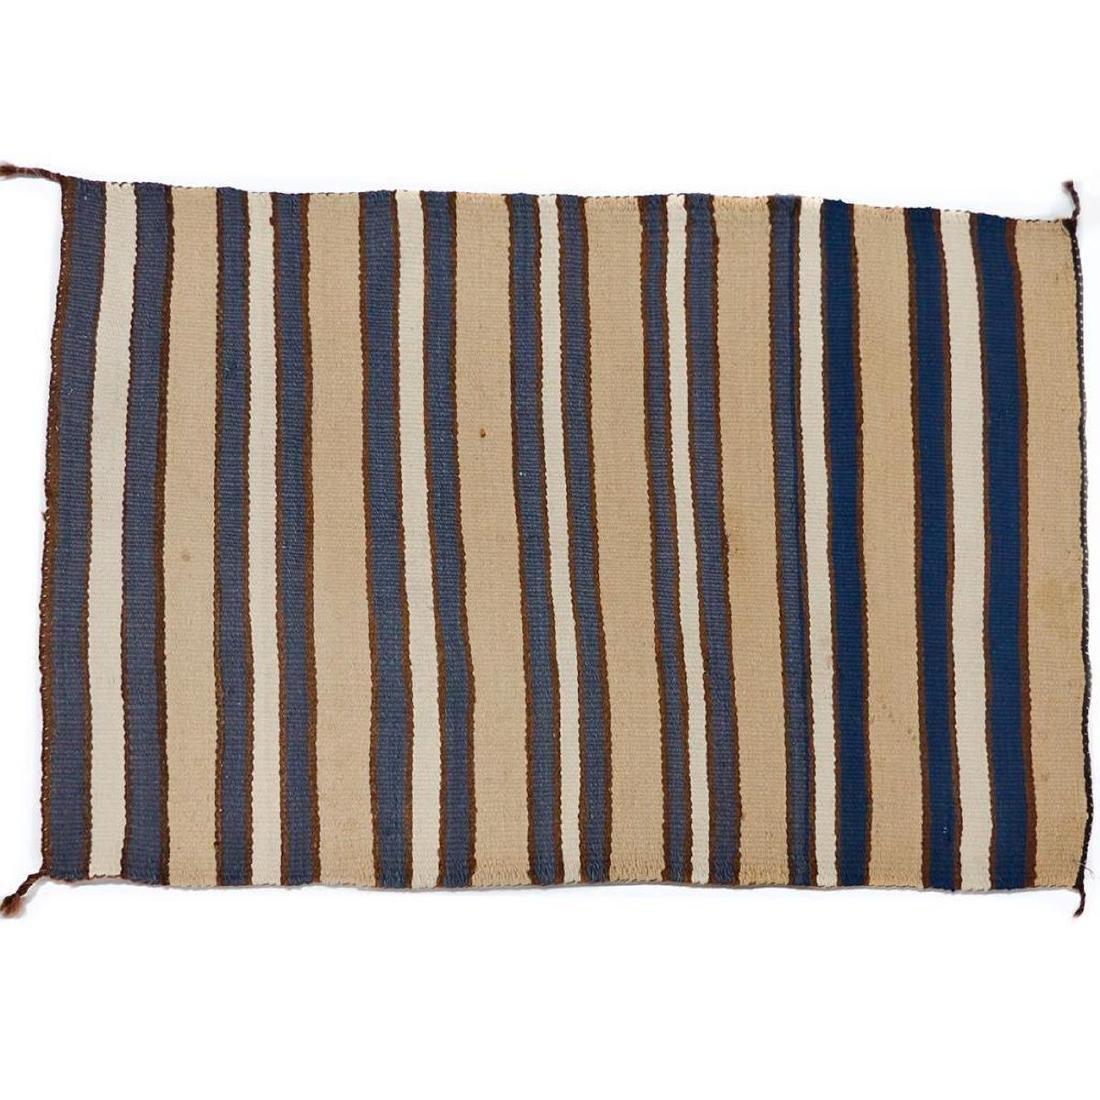 A Hopi Rug